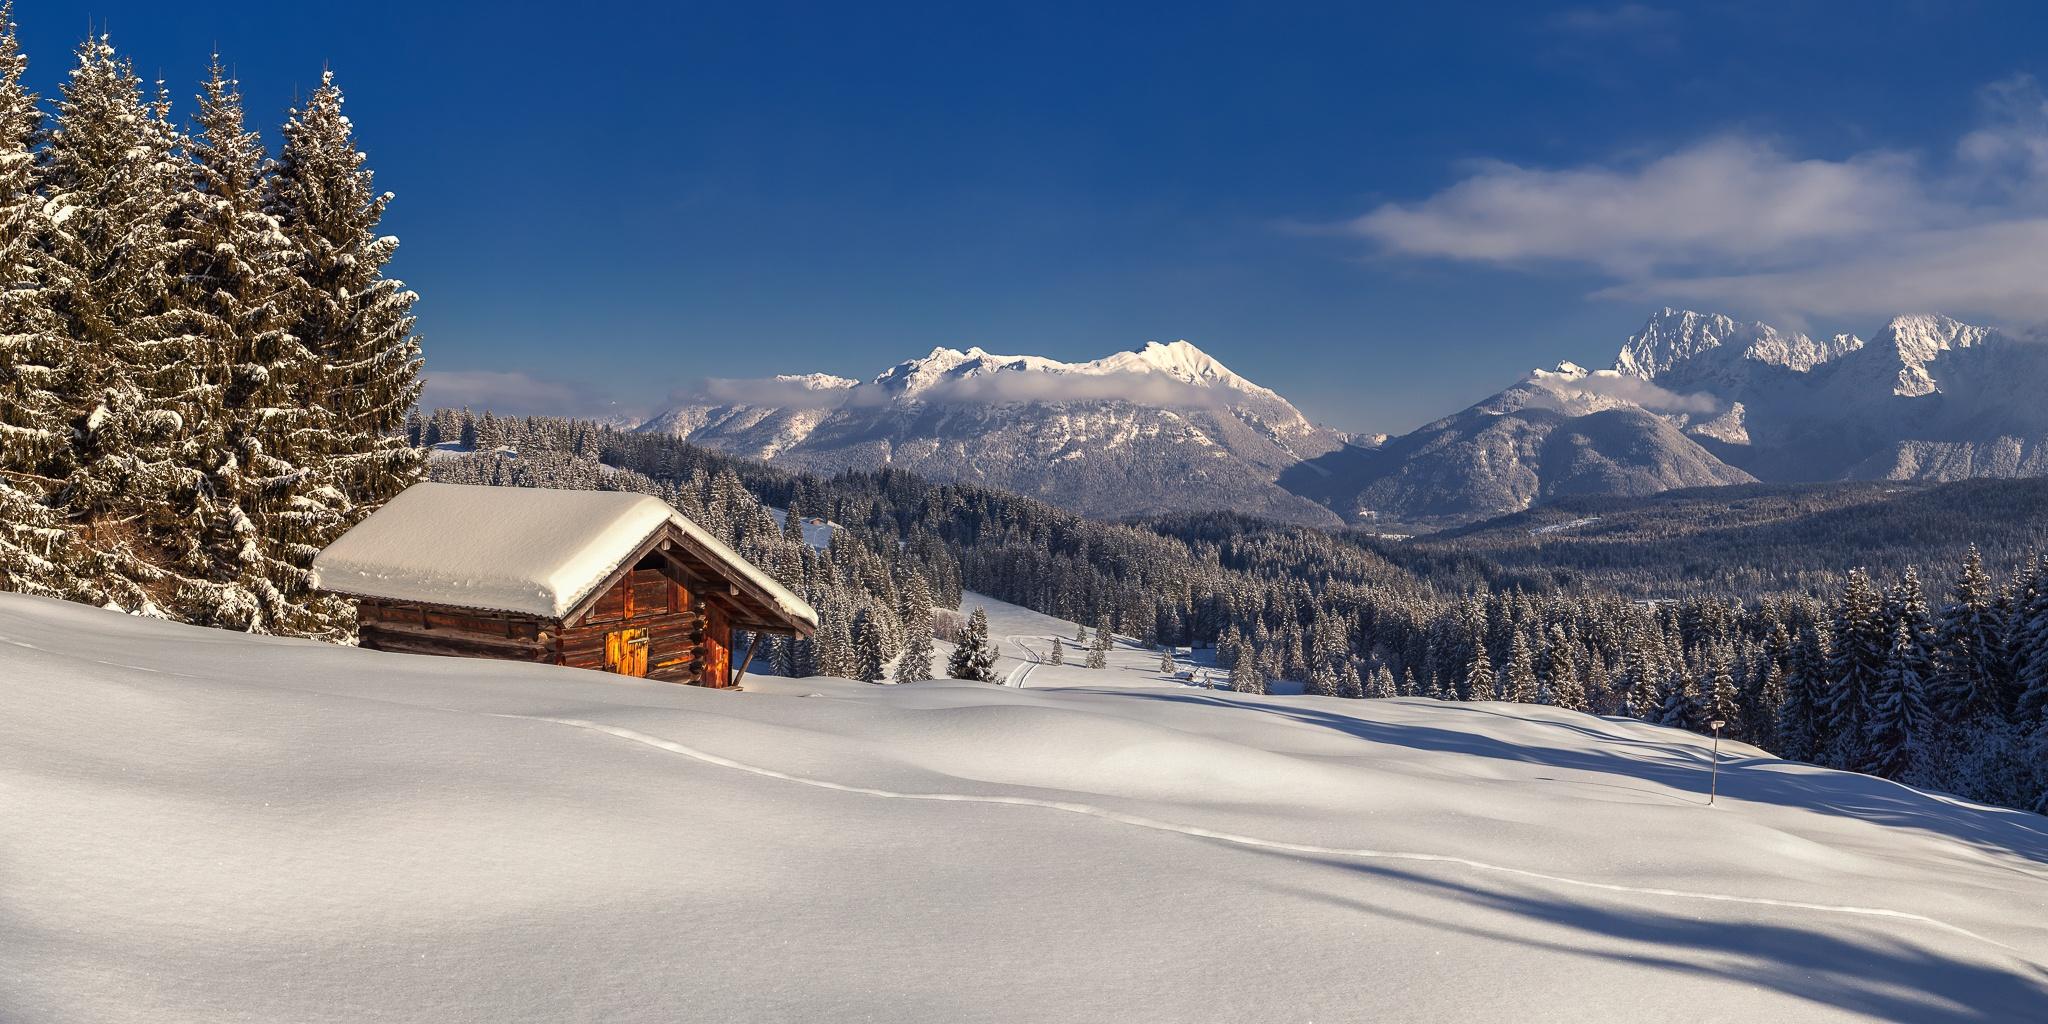 Stadel, Elmau, Soiernspitze, Soierngruppe, Winter, Berglandschaft, Karwendelgebirge